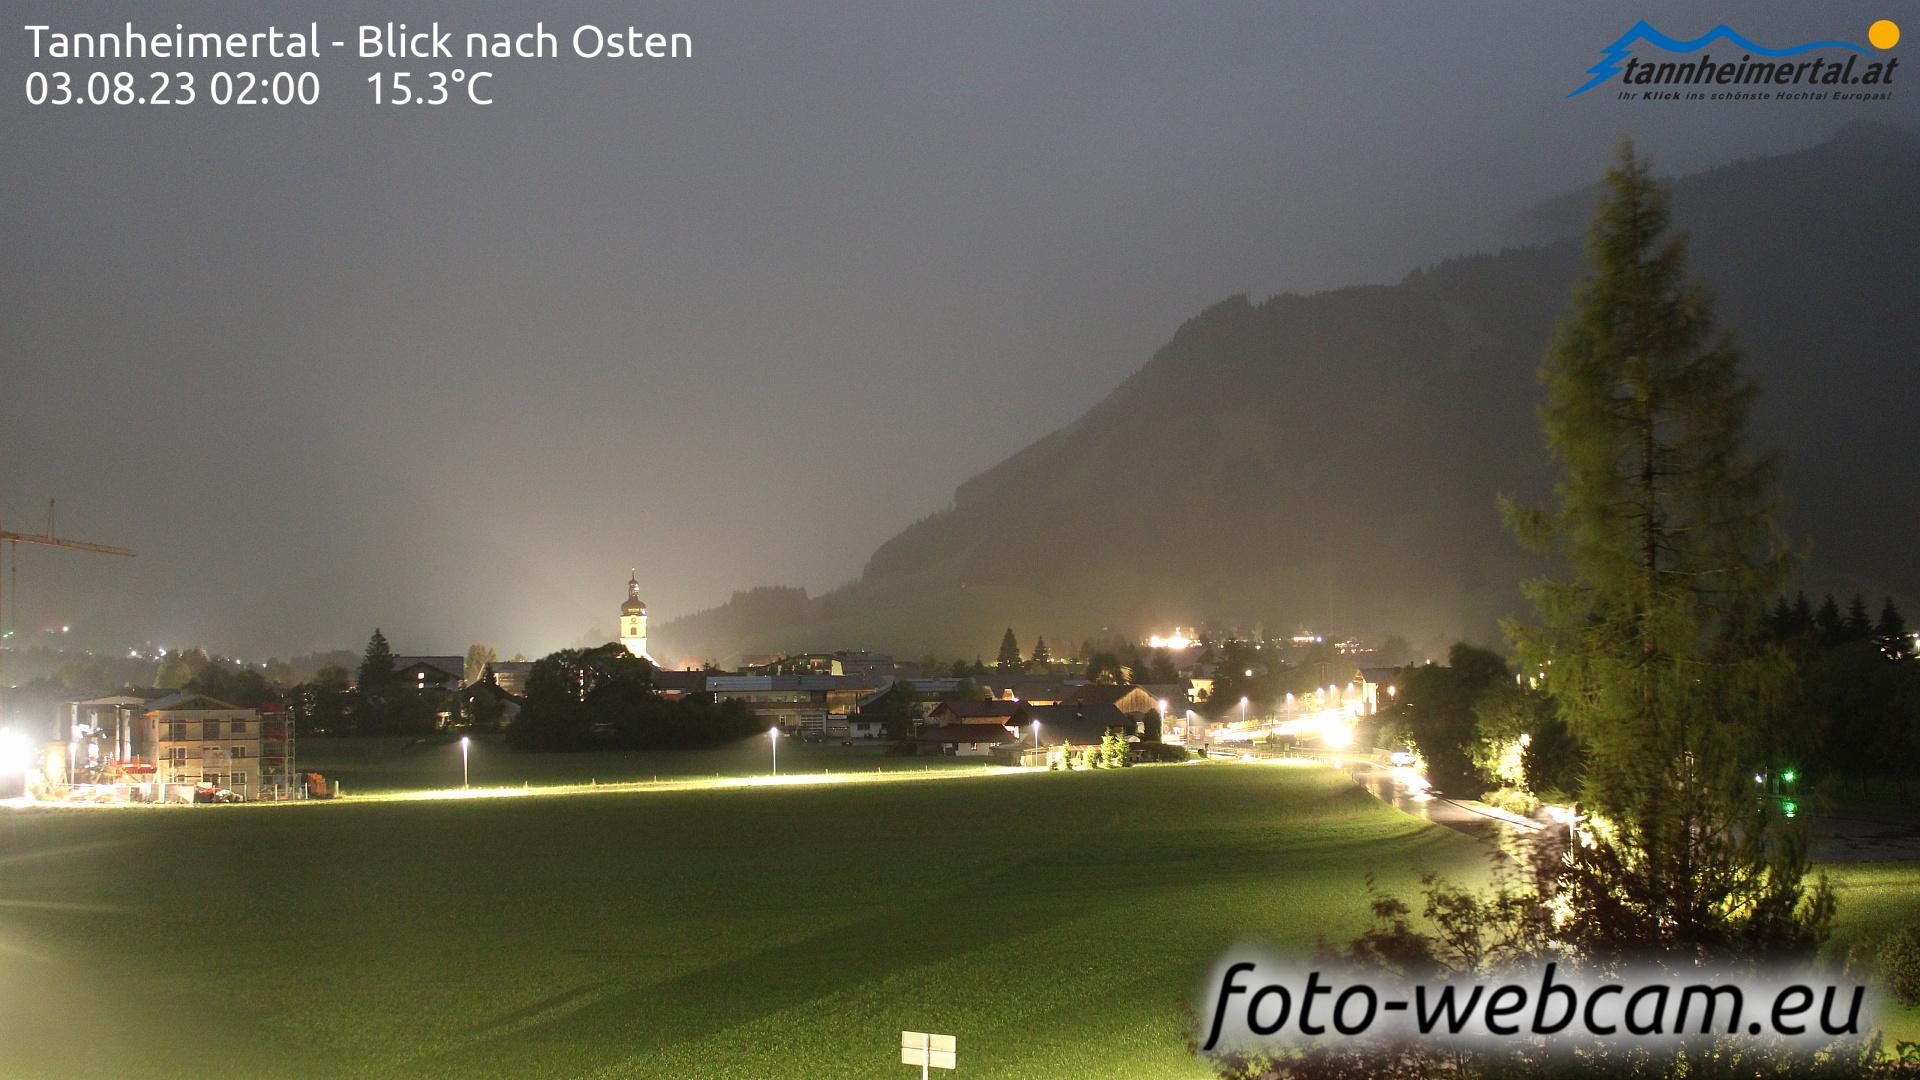 Tannheim Wed. 02:32